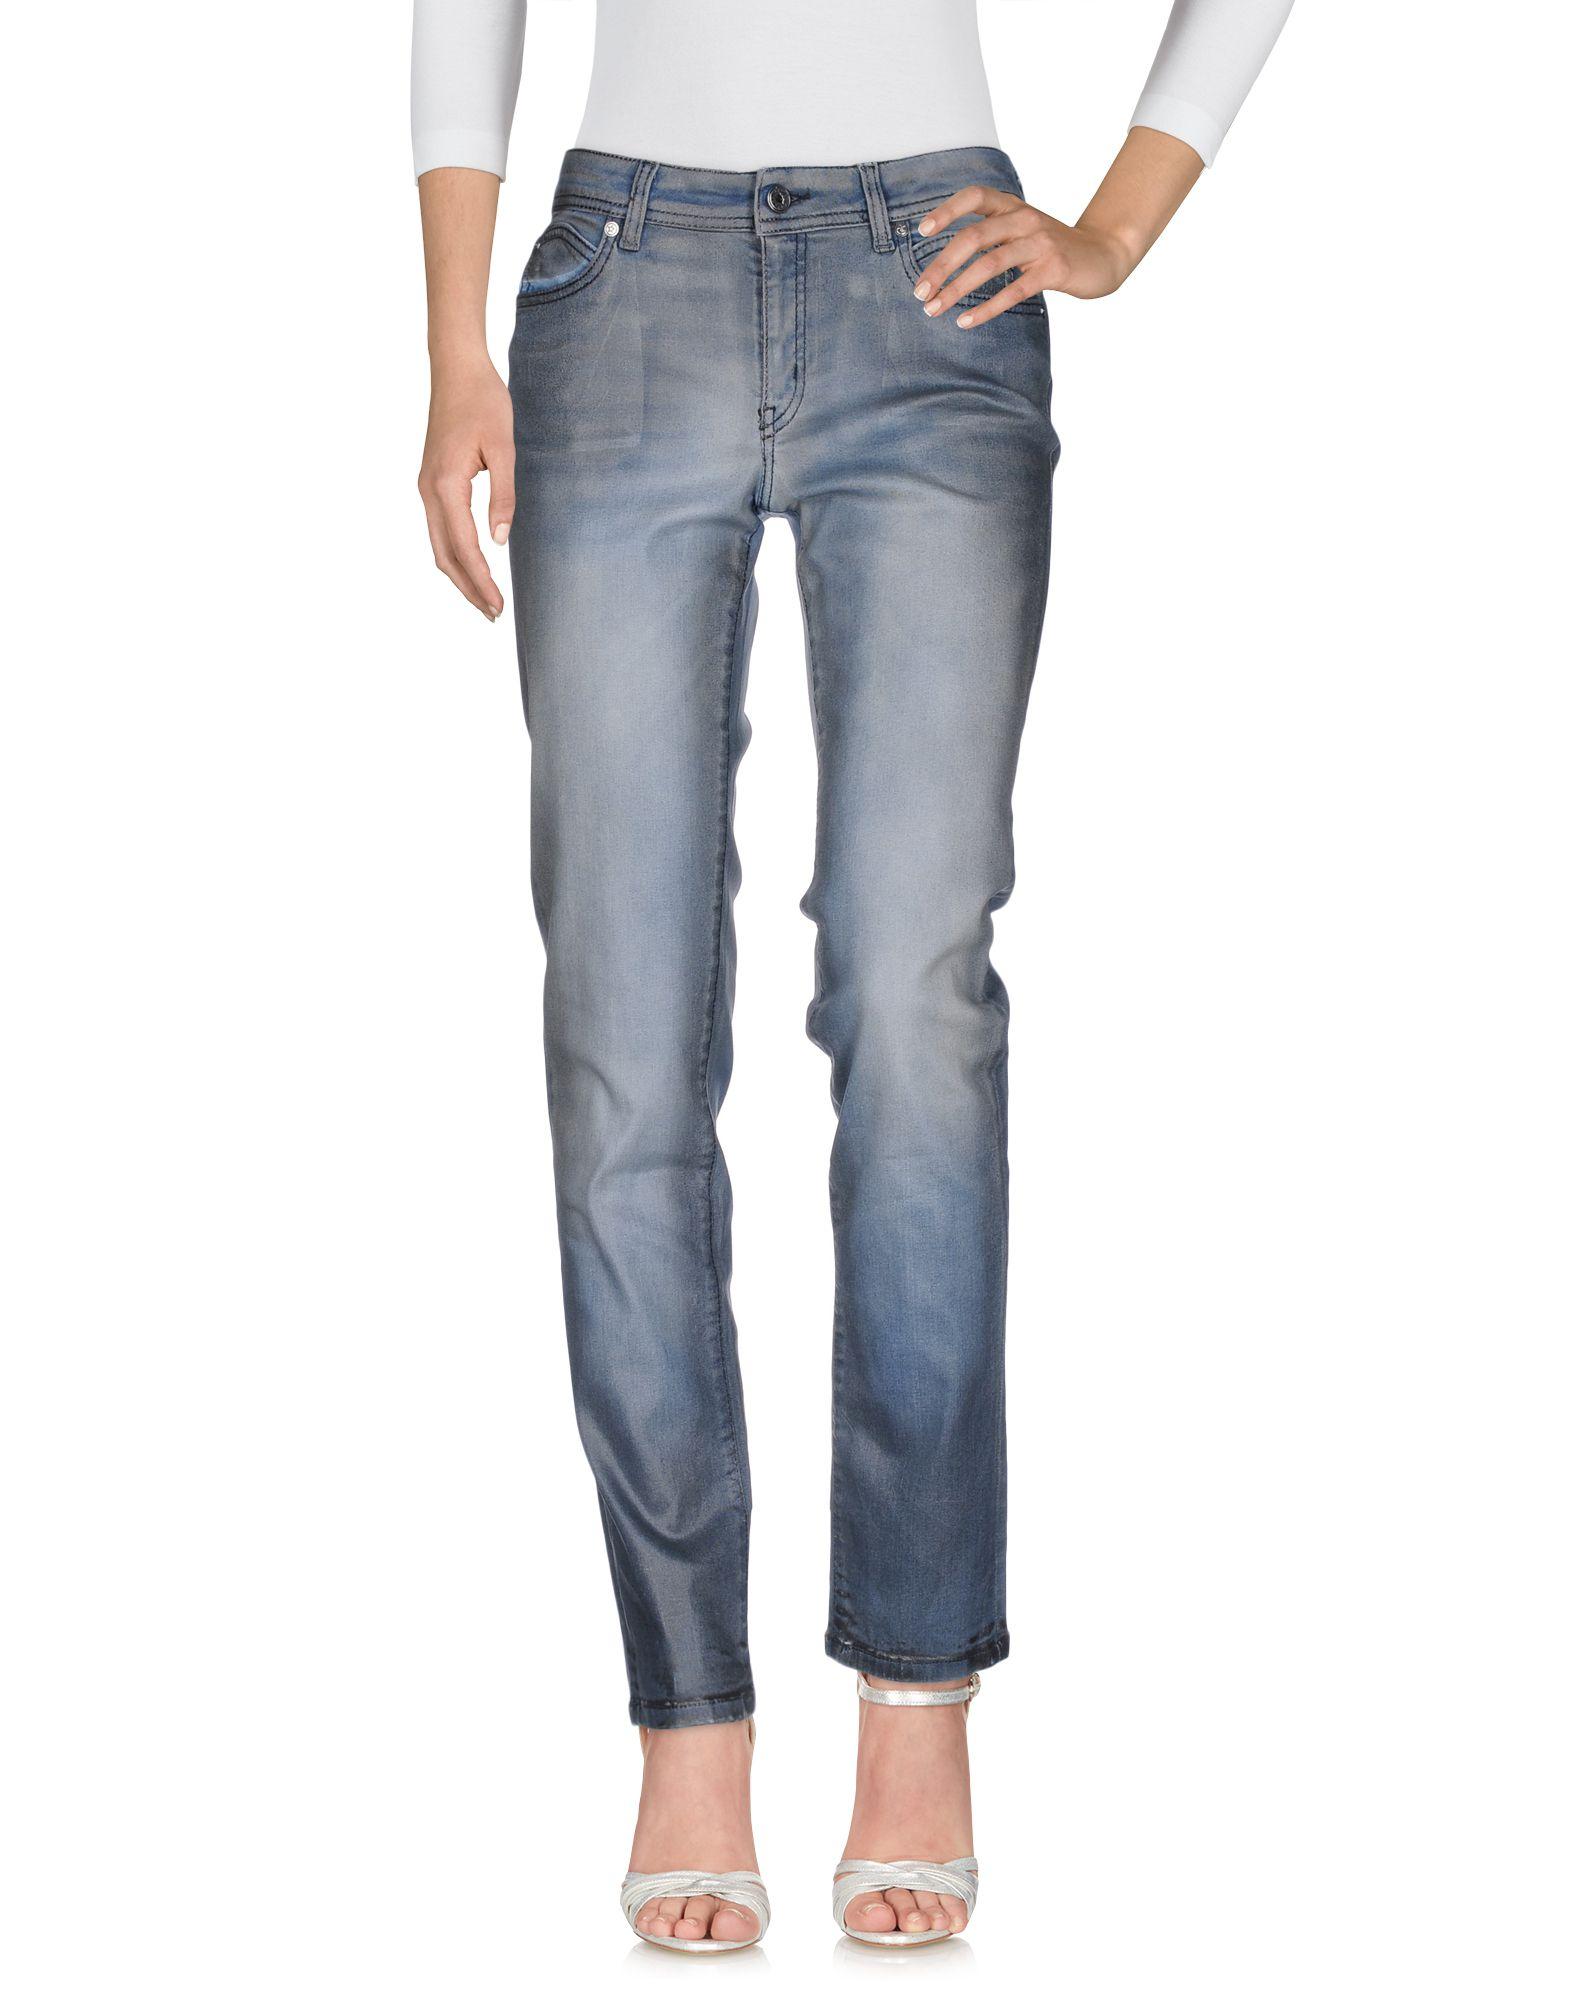 Pantaloni Jeans Just Cavalli Donna - Acquista online su 5W04IrVC